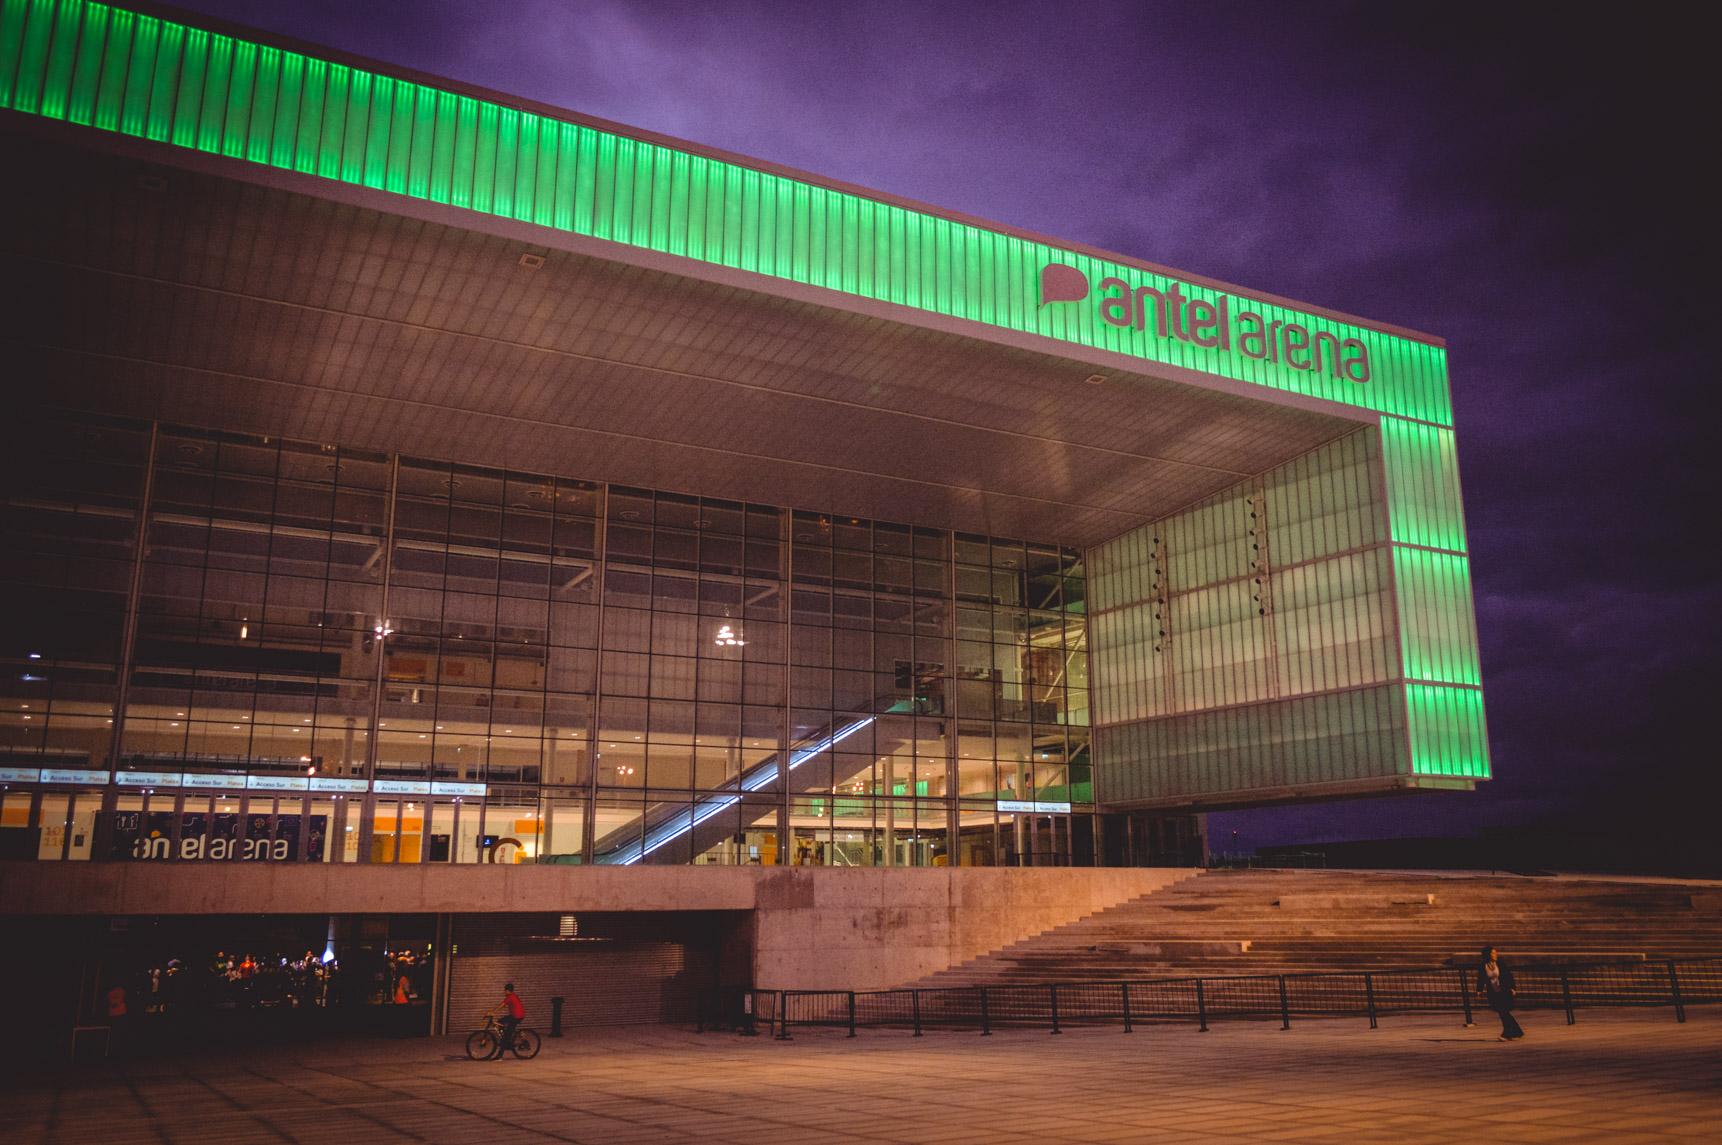 Antel Arena Afuera noche.jpg -